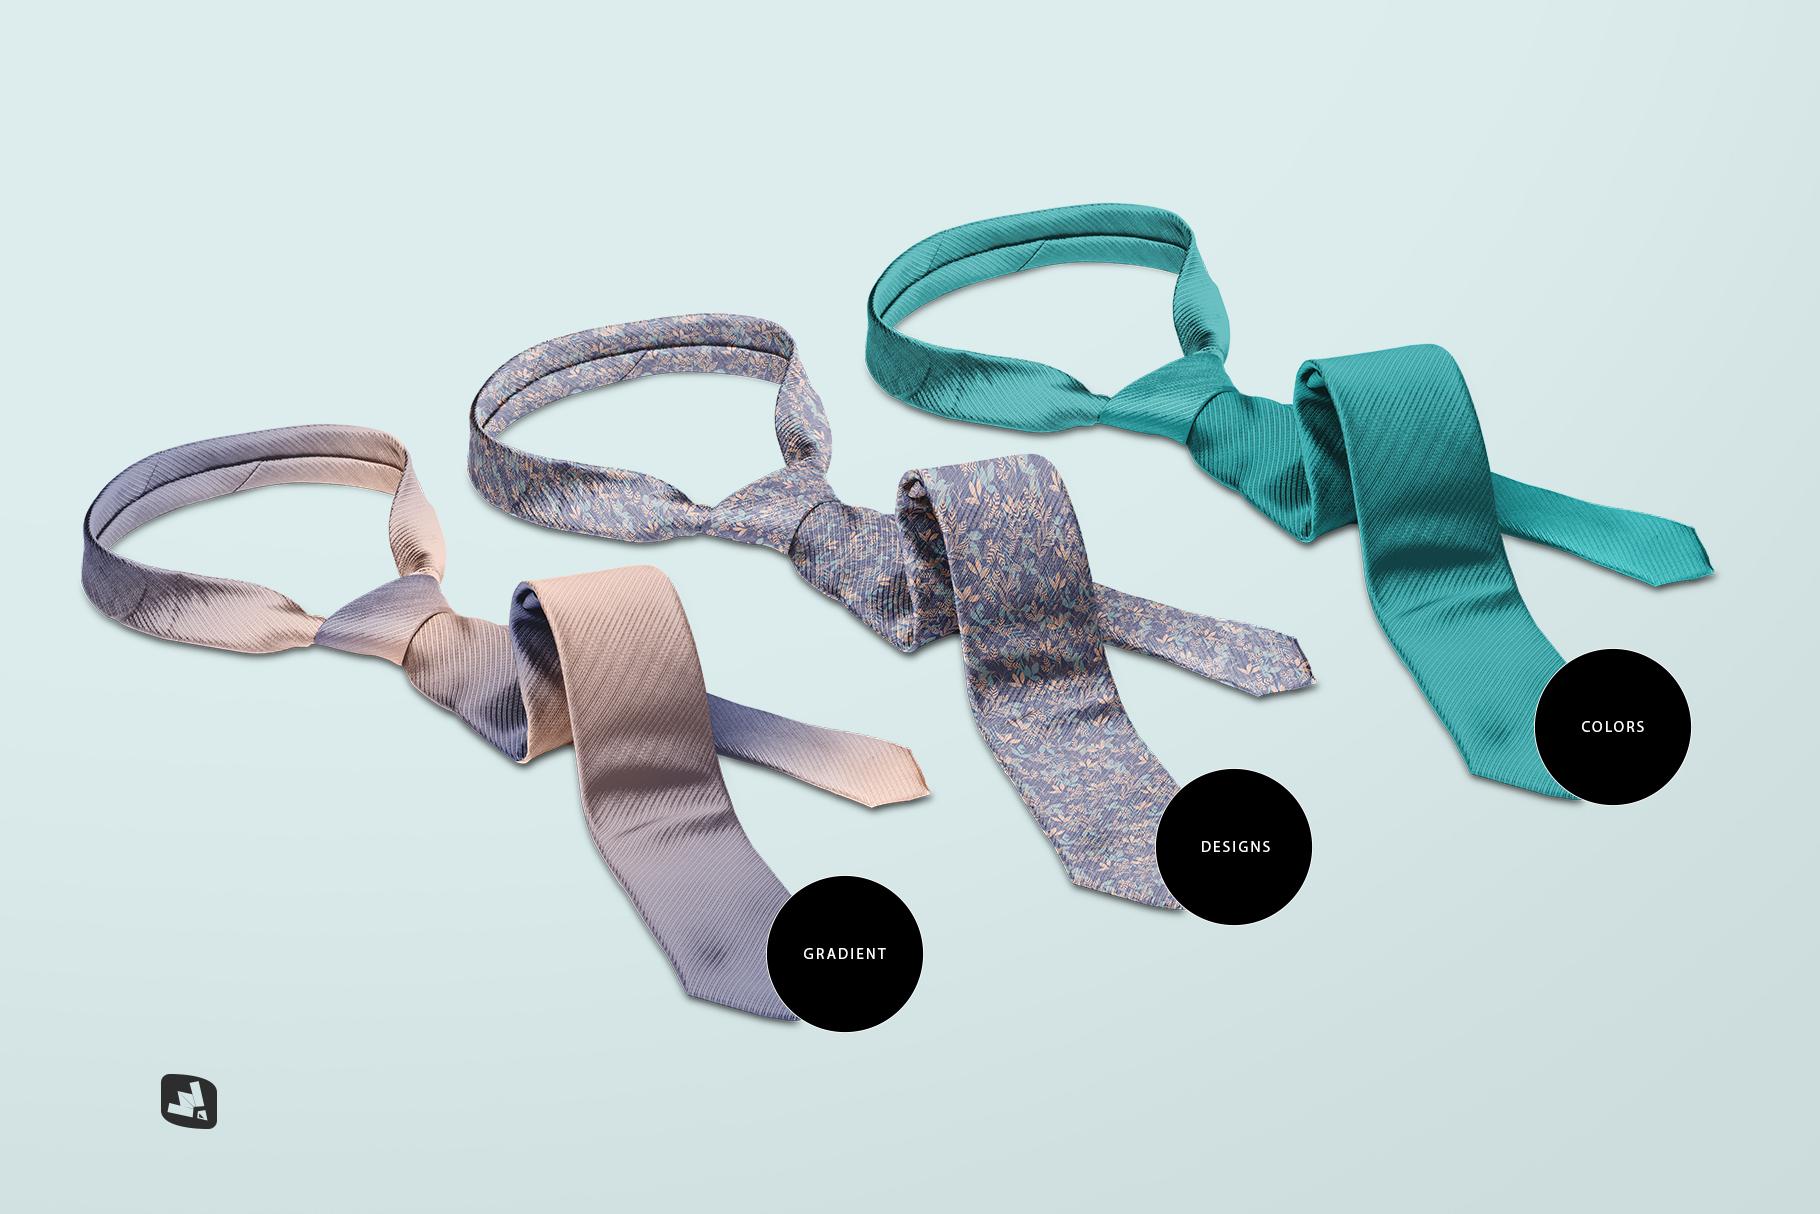 types of the men's formal tie mockup